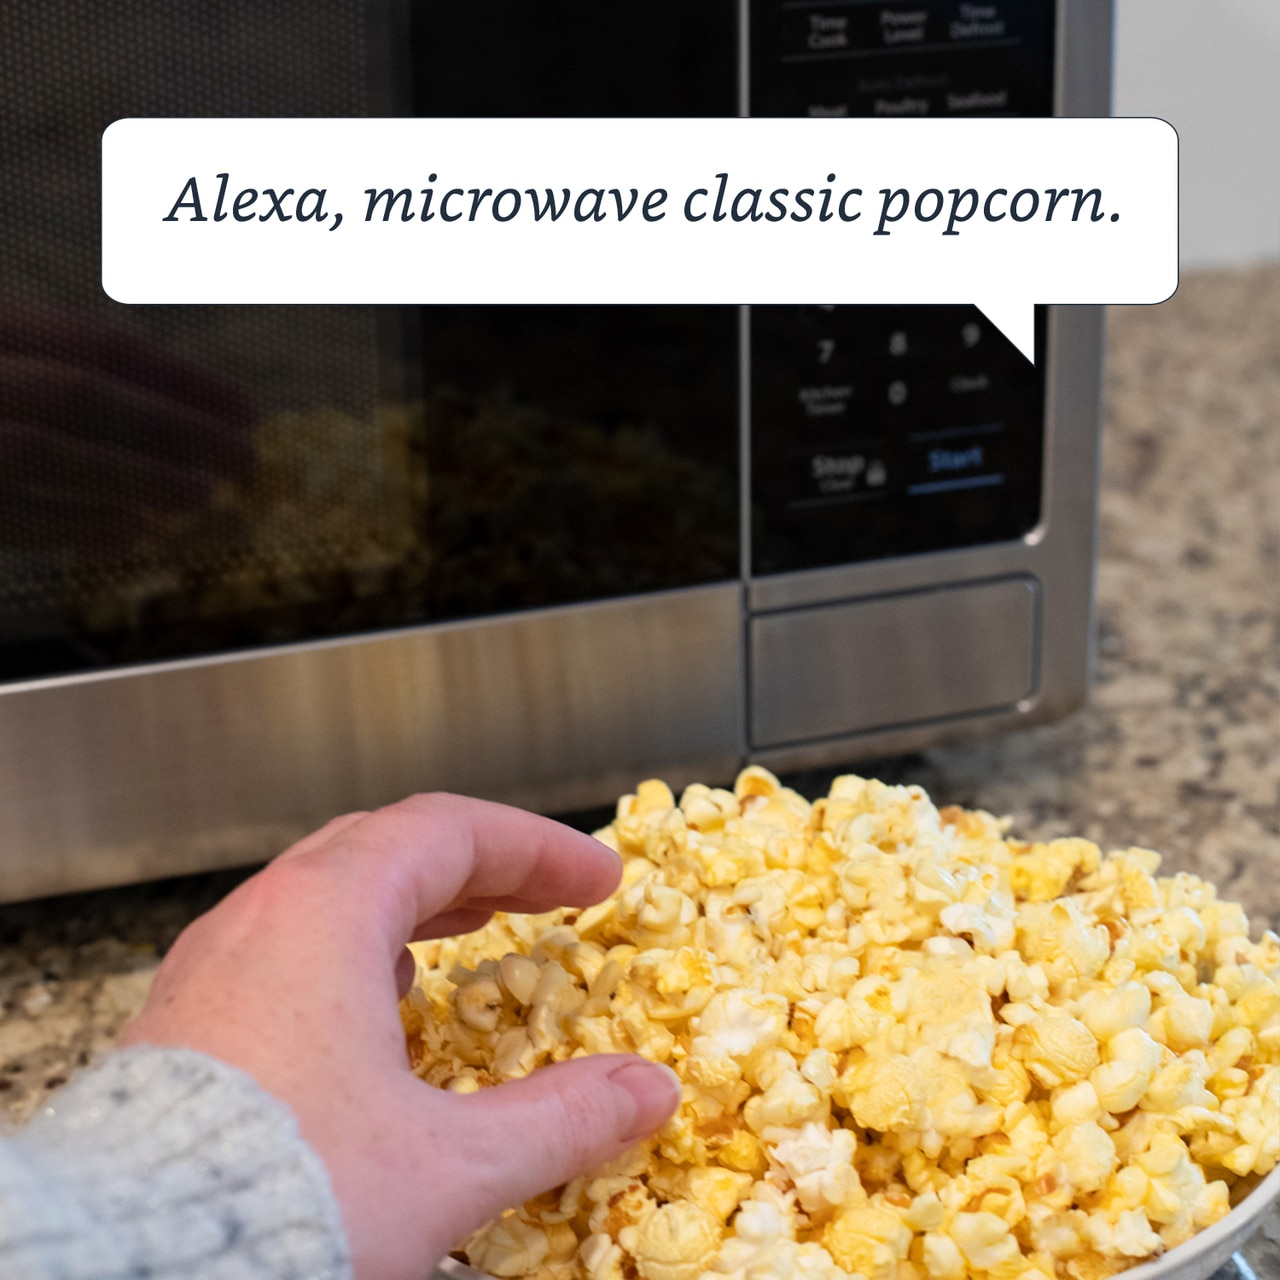 1.4 cu. ft. Sharp Stainless Steel Smart Microwave (SMC1449FS) – Alexa Microwave Popcorn Command